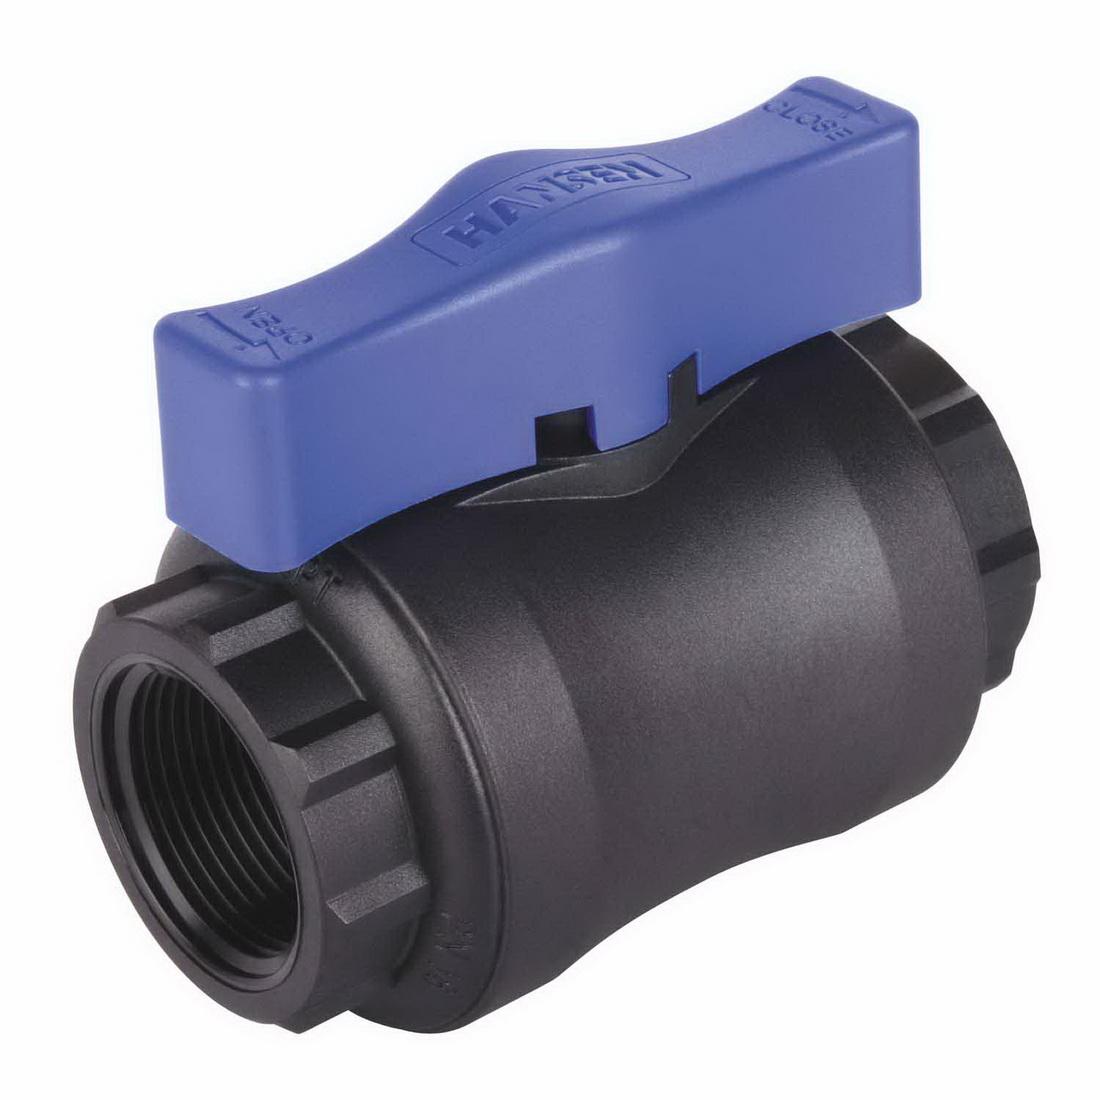 HBV Series Full Flow Compact Ball Valve 15mm F BSPT Glass Fibre Reinforced Nylon Black/Blue